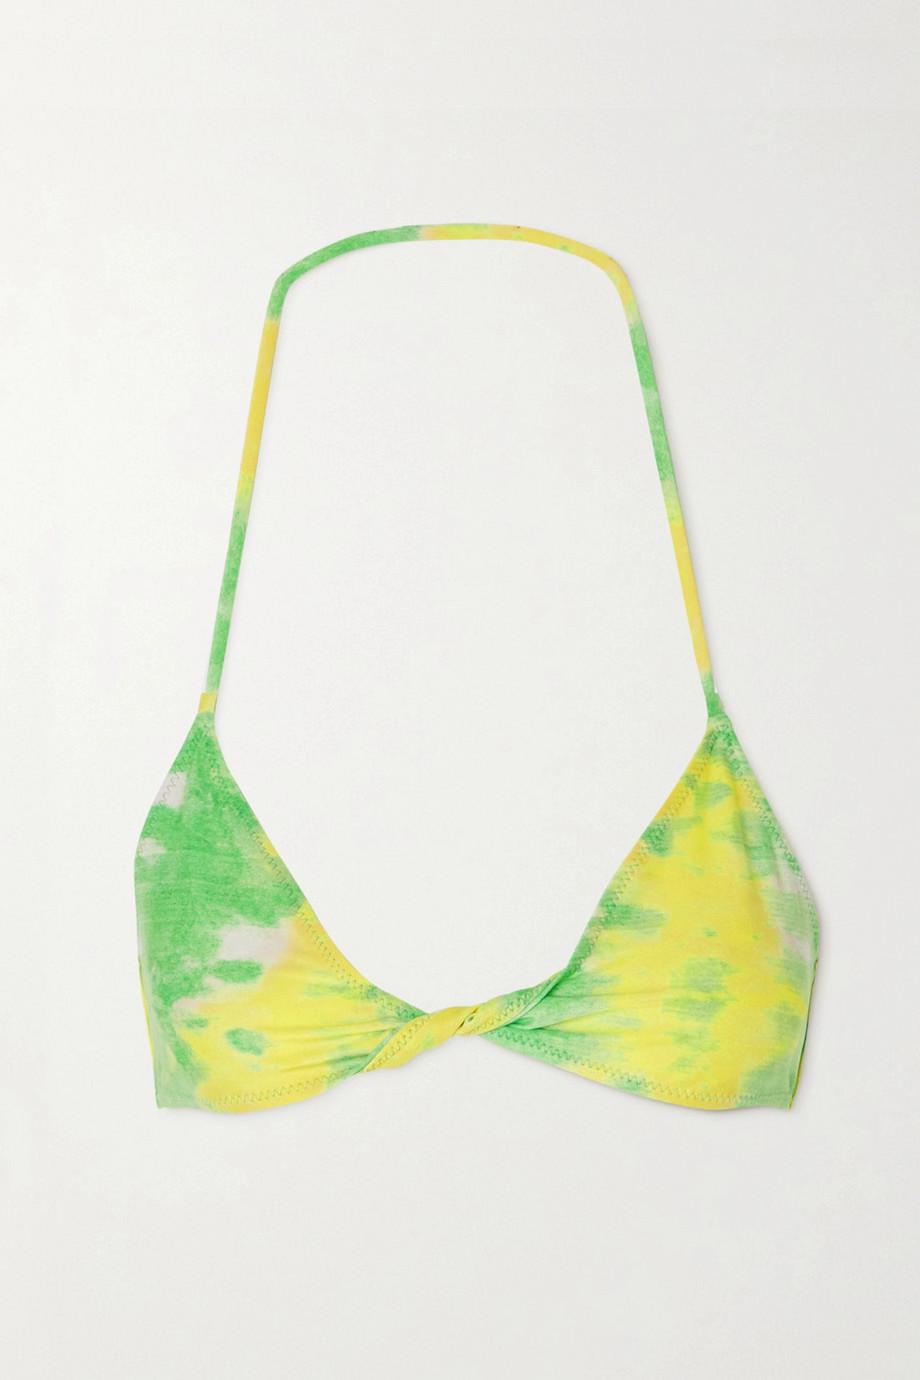 GANNI + NET SUSTAIN twist-front printed recycled bikini top